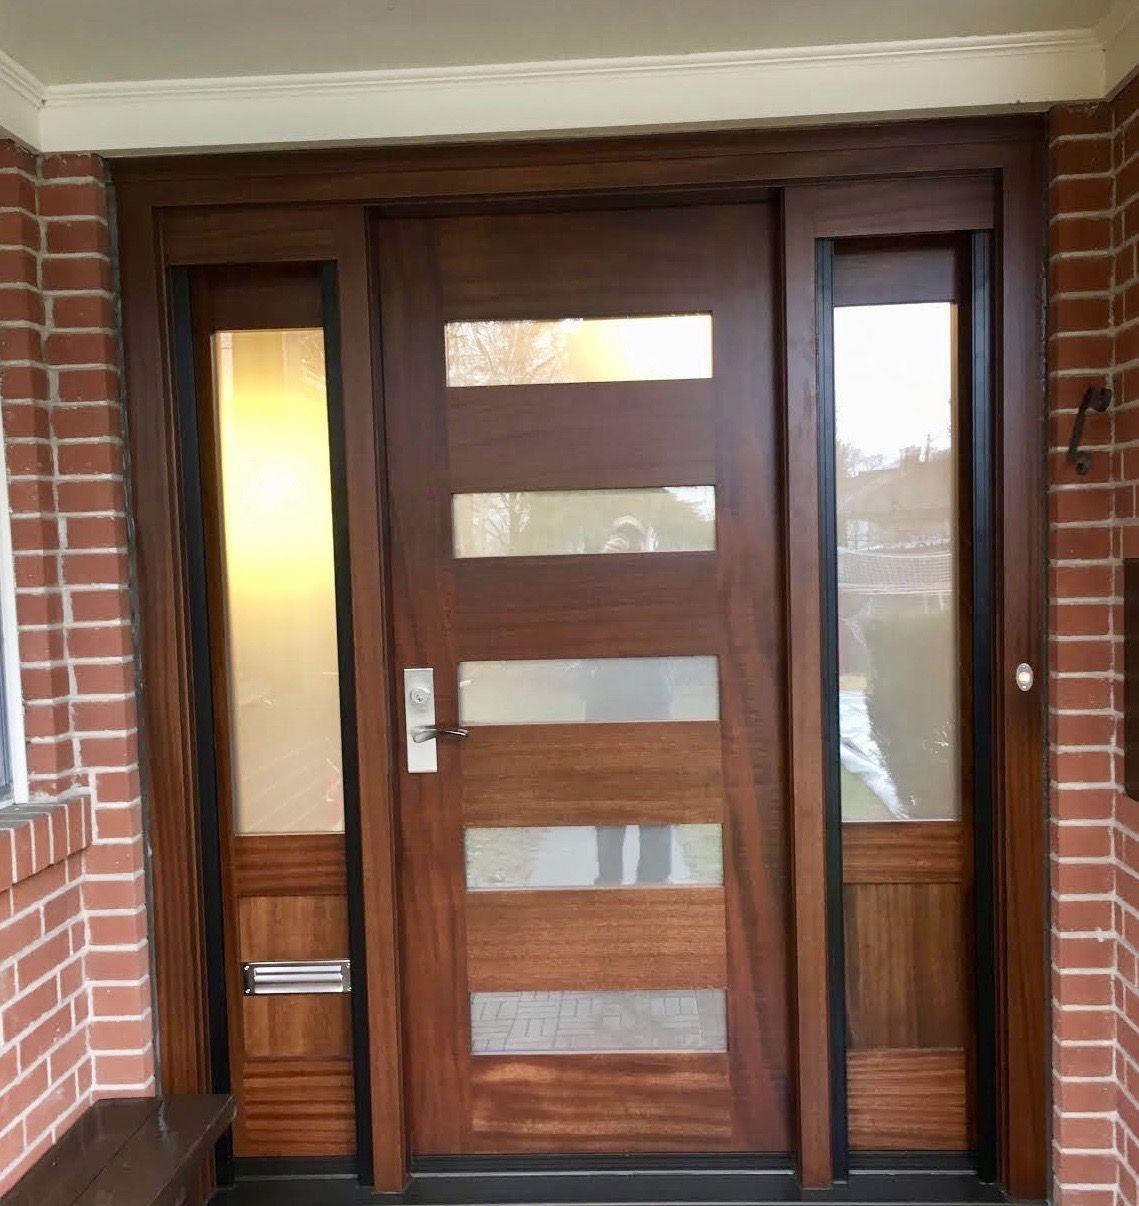 Amberwood Doors Inc: *Contemporary* Sleek & Modern #AmberwoodDoors #mahogany